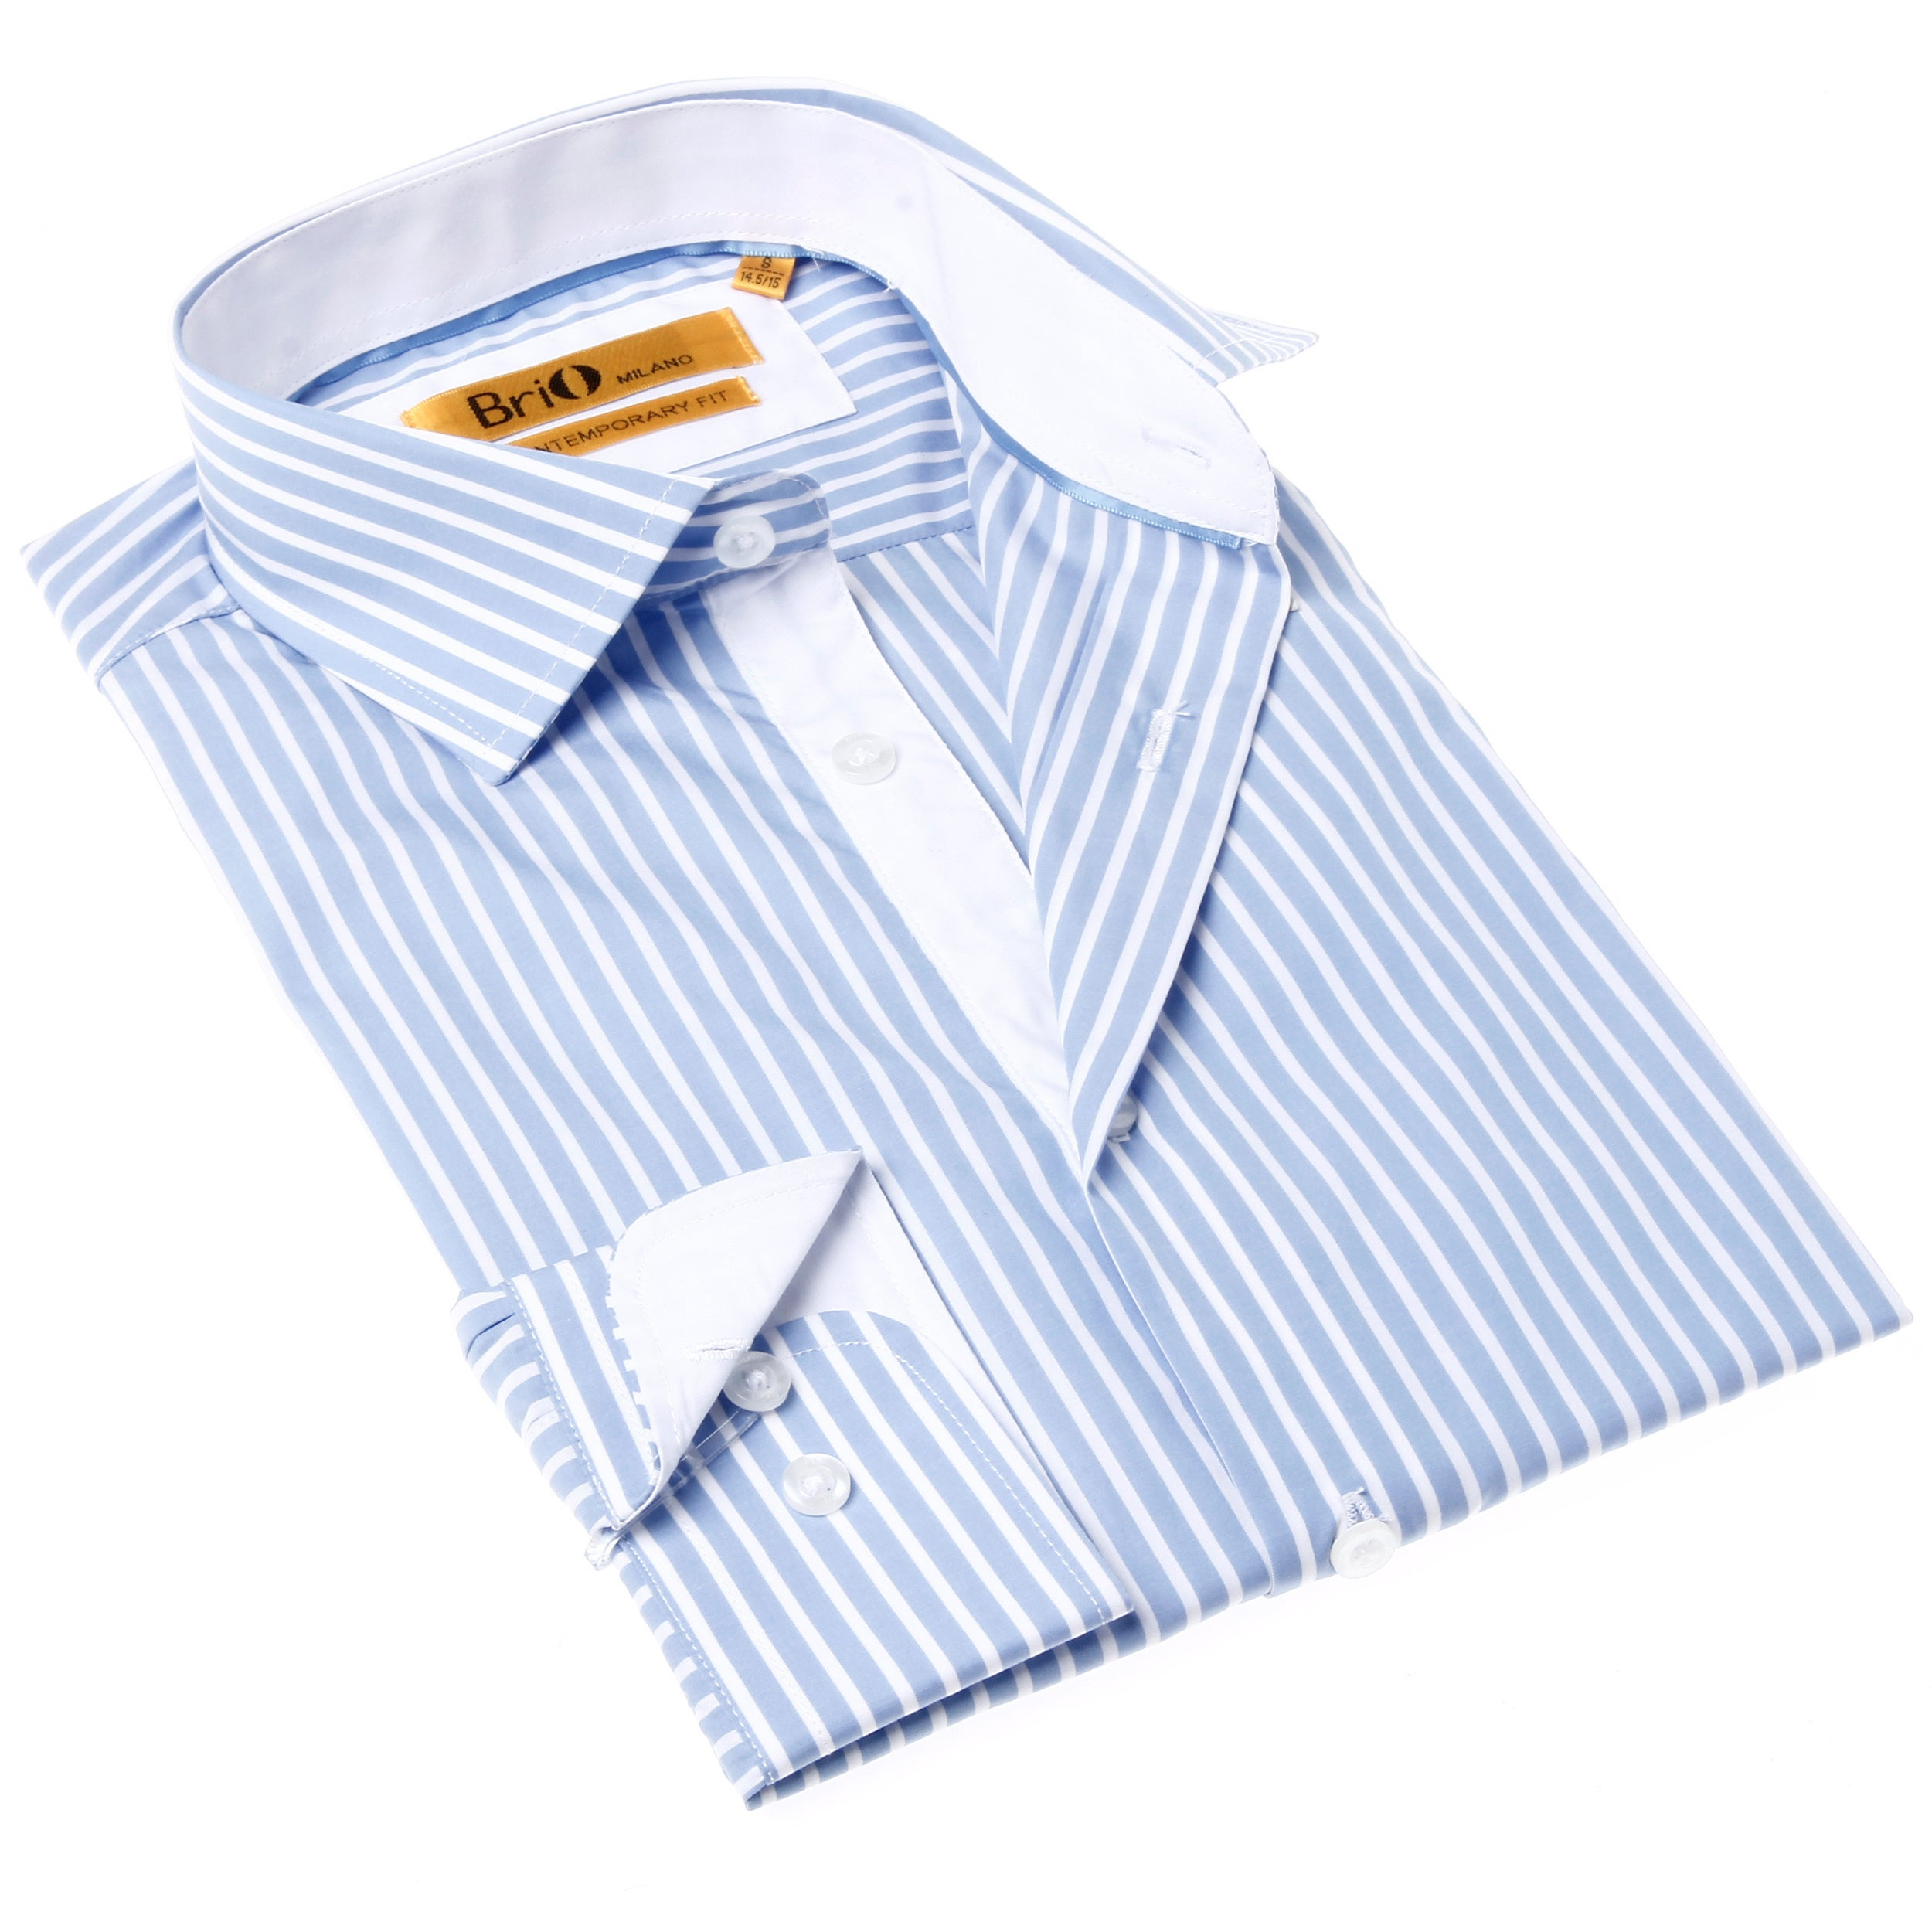 7bf24f68 Blue And White Striped Mens Dress Shirt | Top Mode Depot